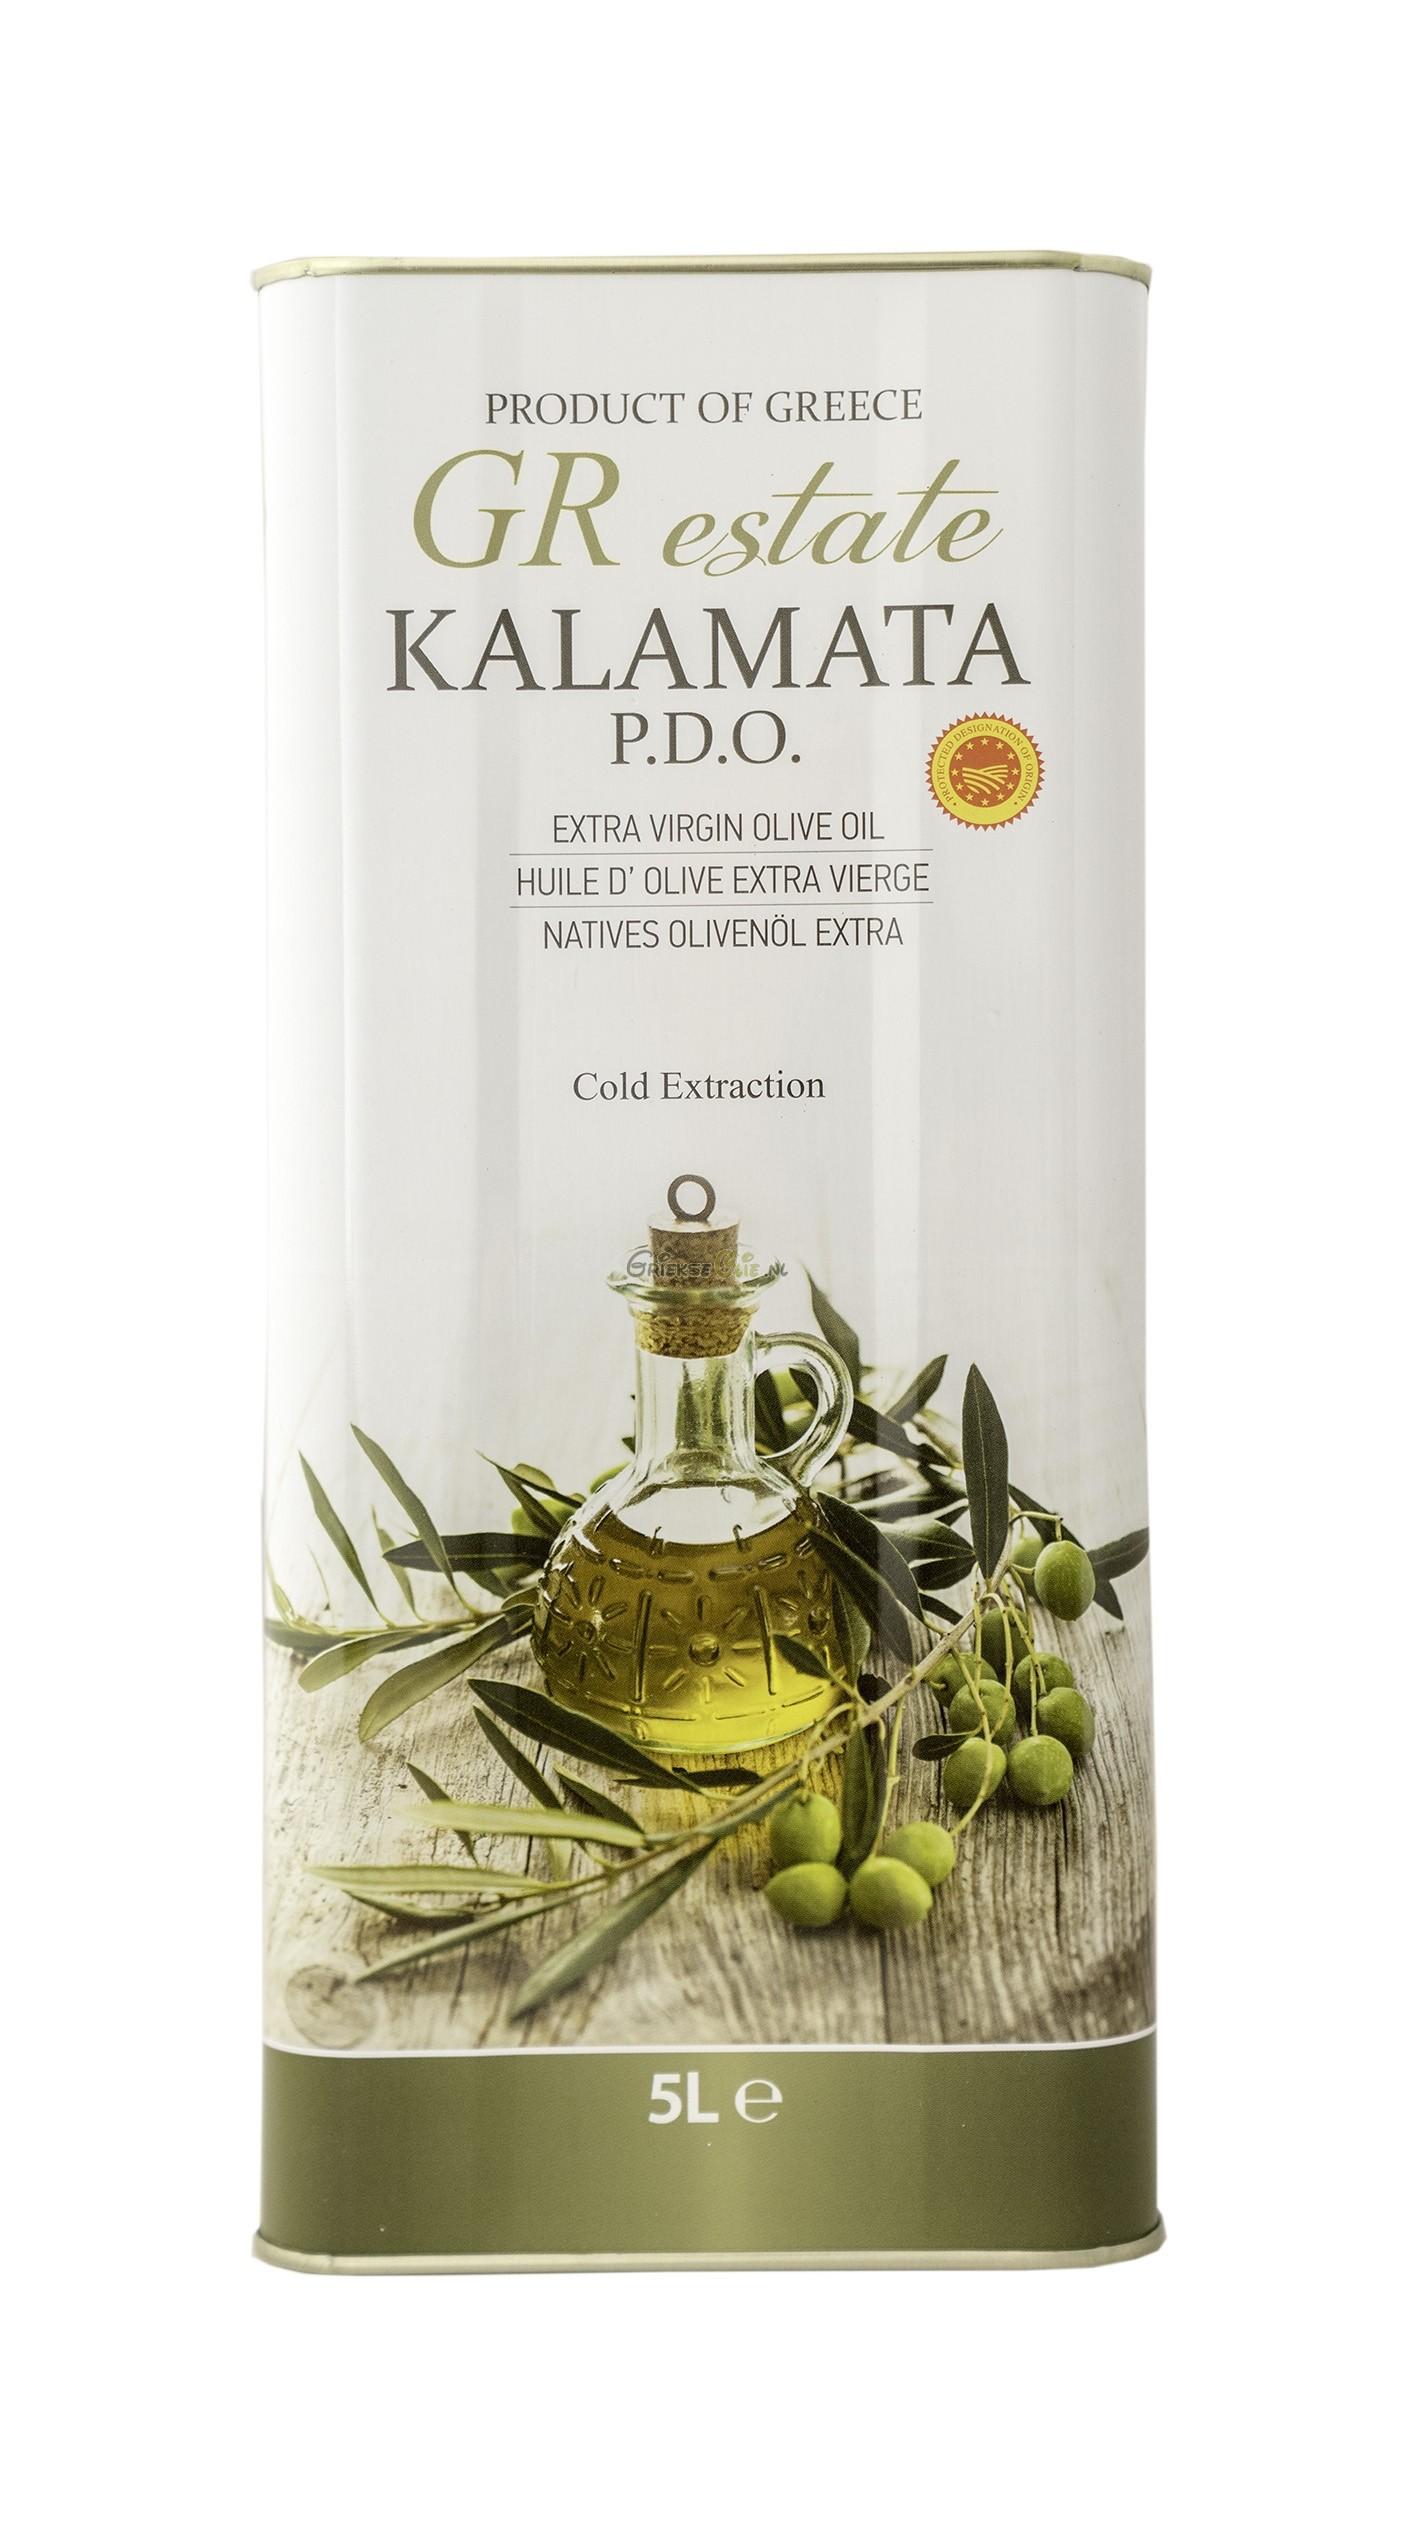 Extra Vergine Olijfolie uit Kalamata 5 liter in blik - oogst 2018-2019